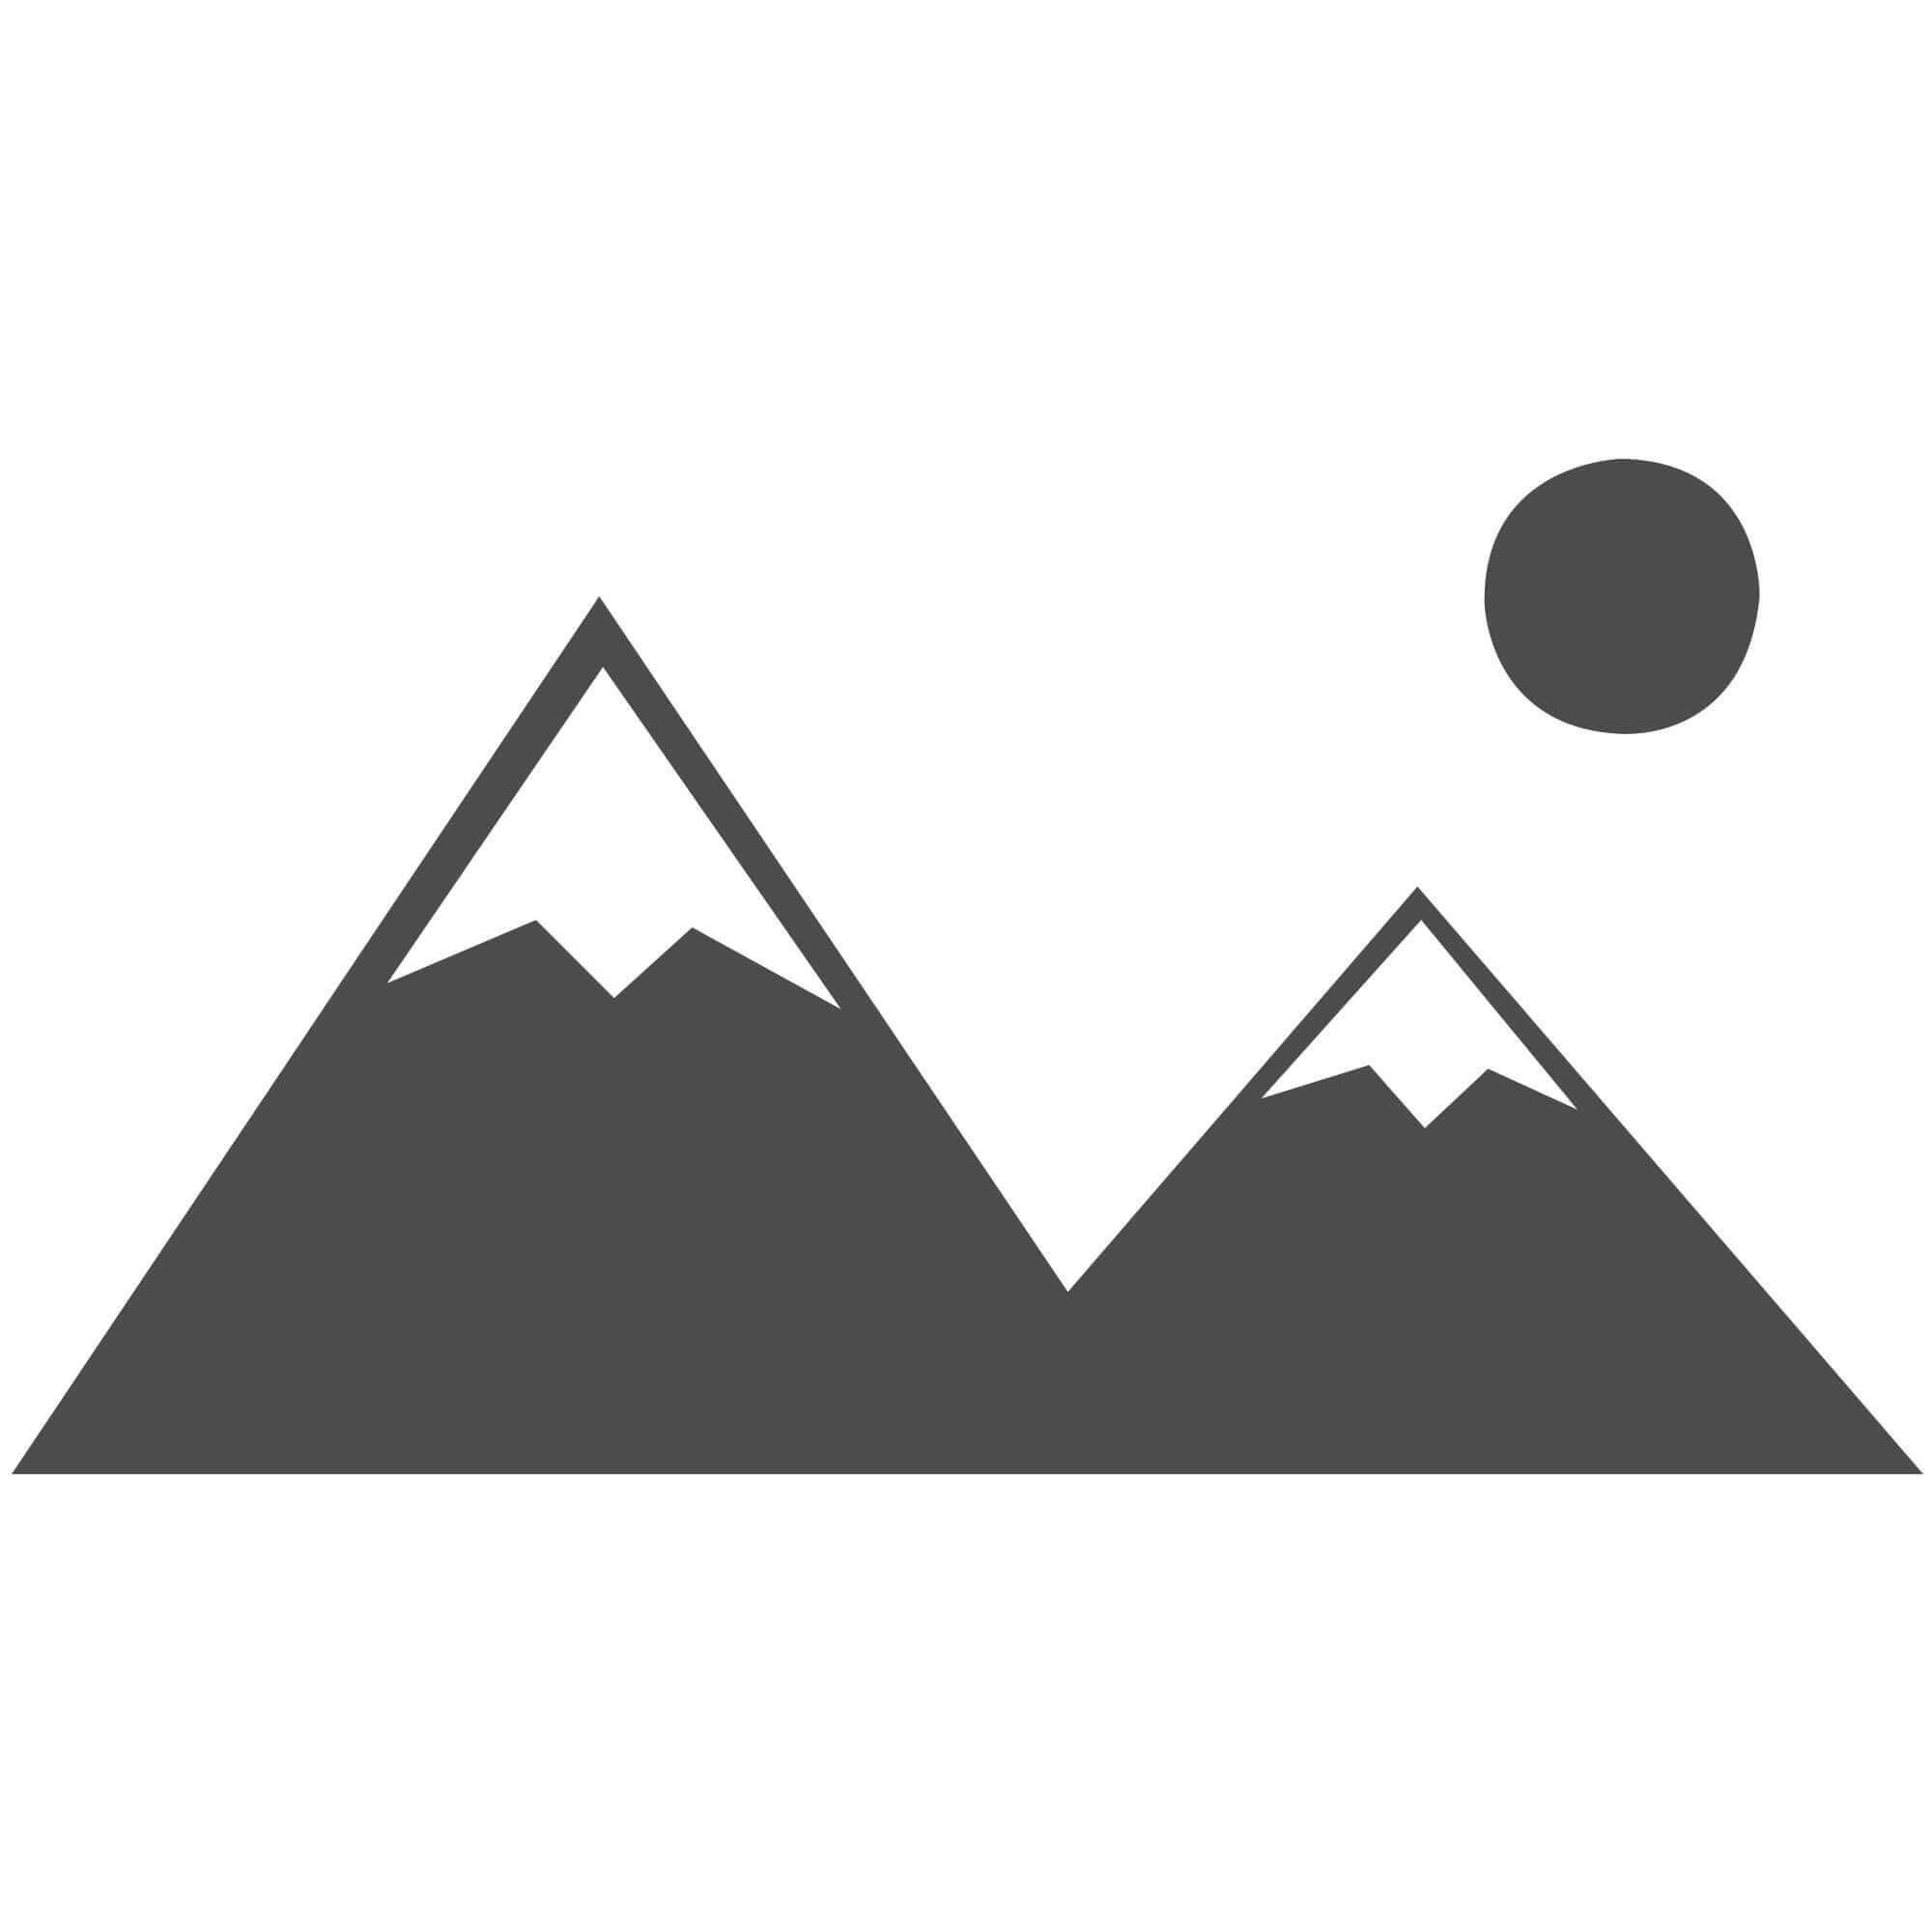 "Nordic Cariboo Shaggy Rug - Beige - Size 120 x 170 cm (4' x 5'7"")"